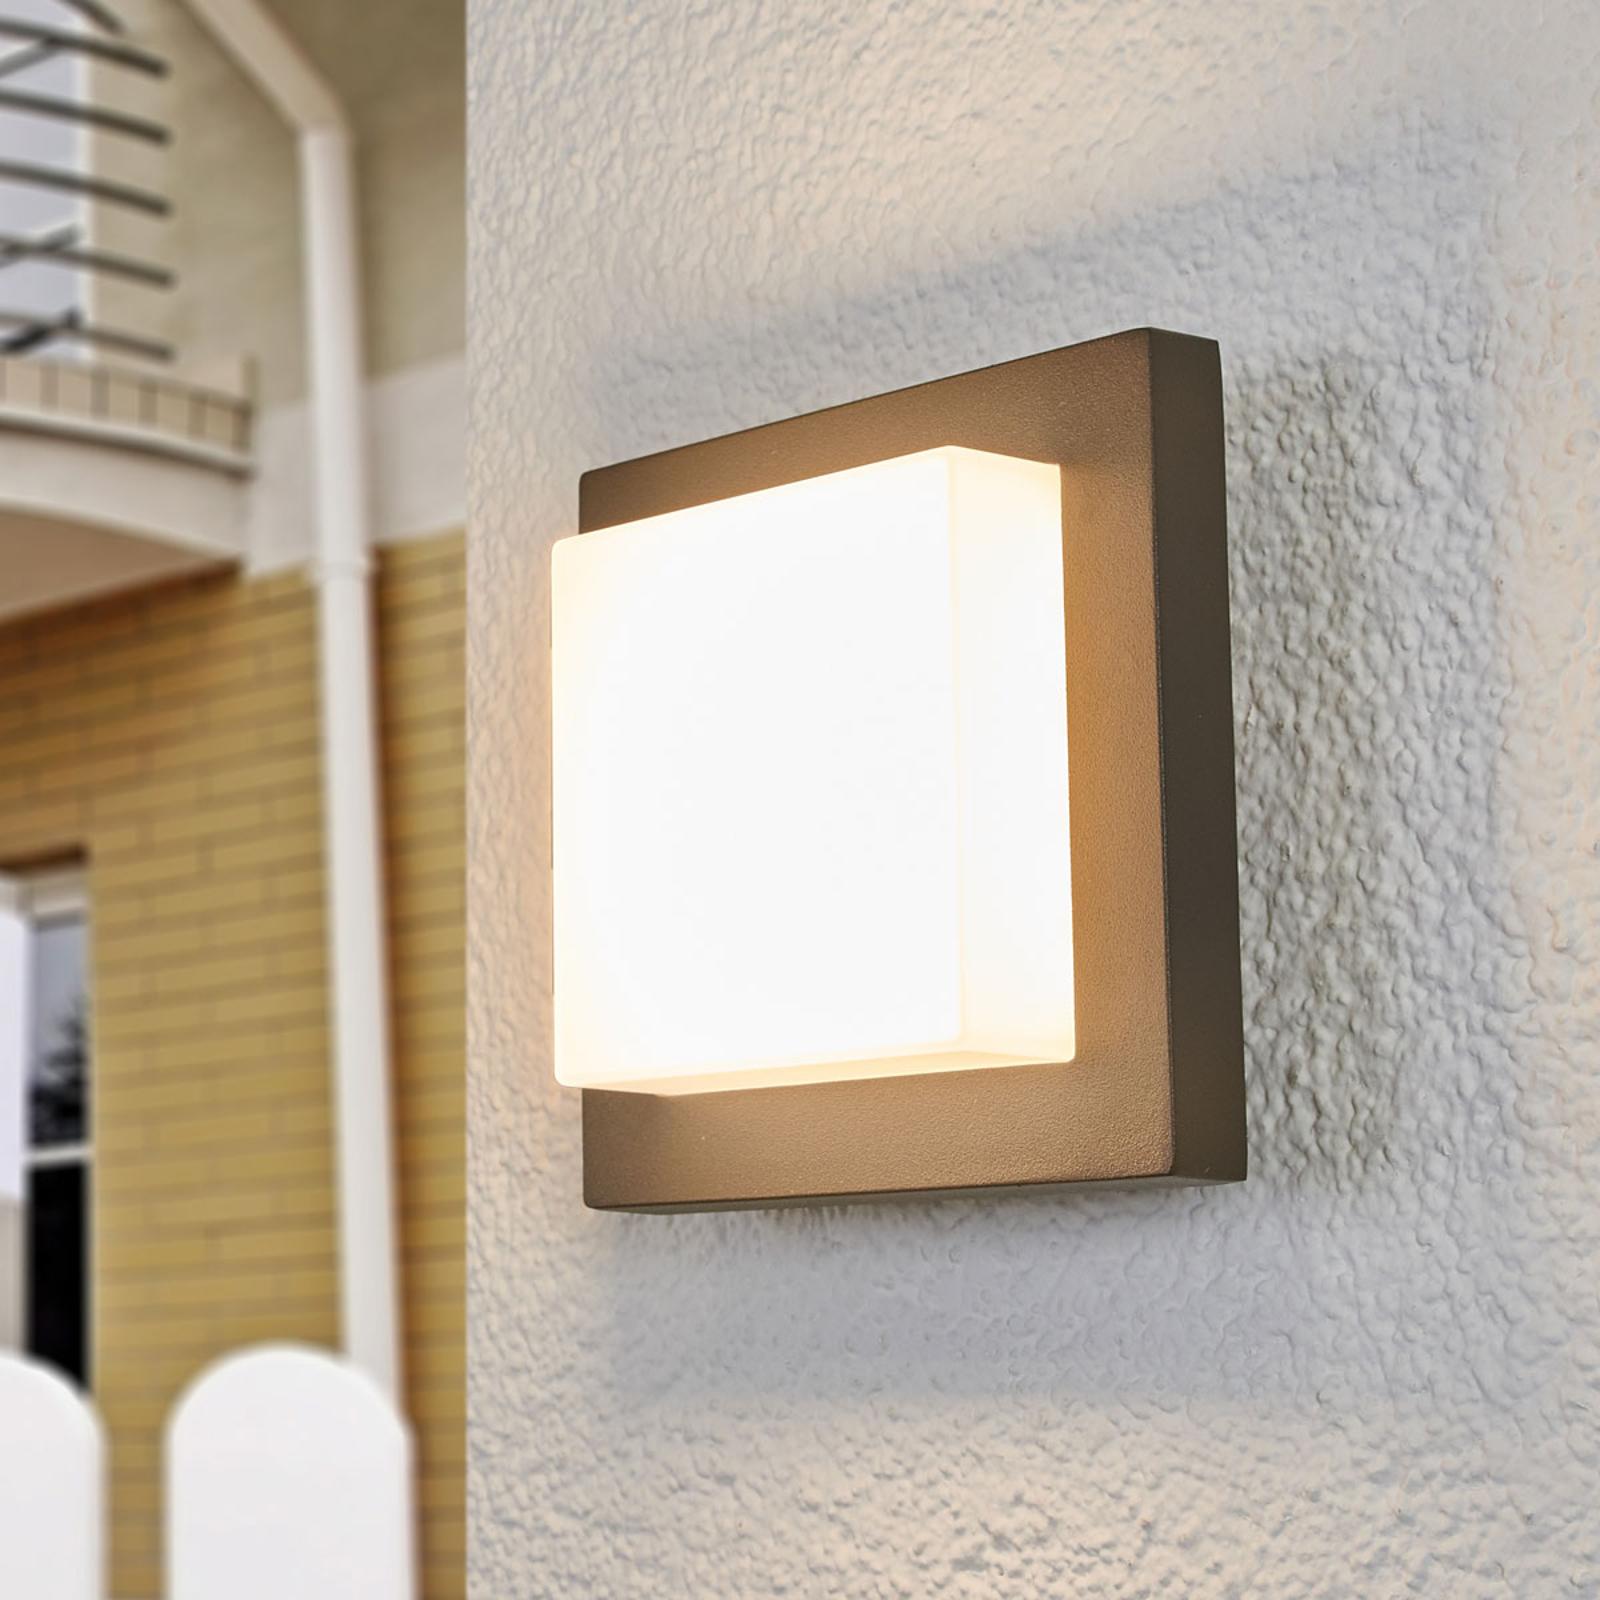 Celeste discreet LED outdoor wall light_9618018_1